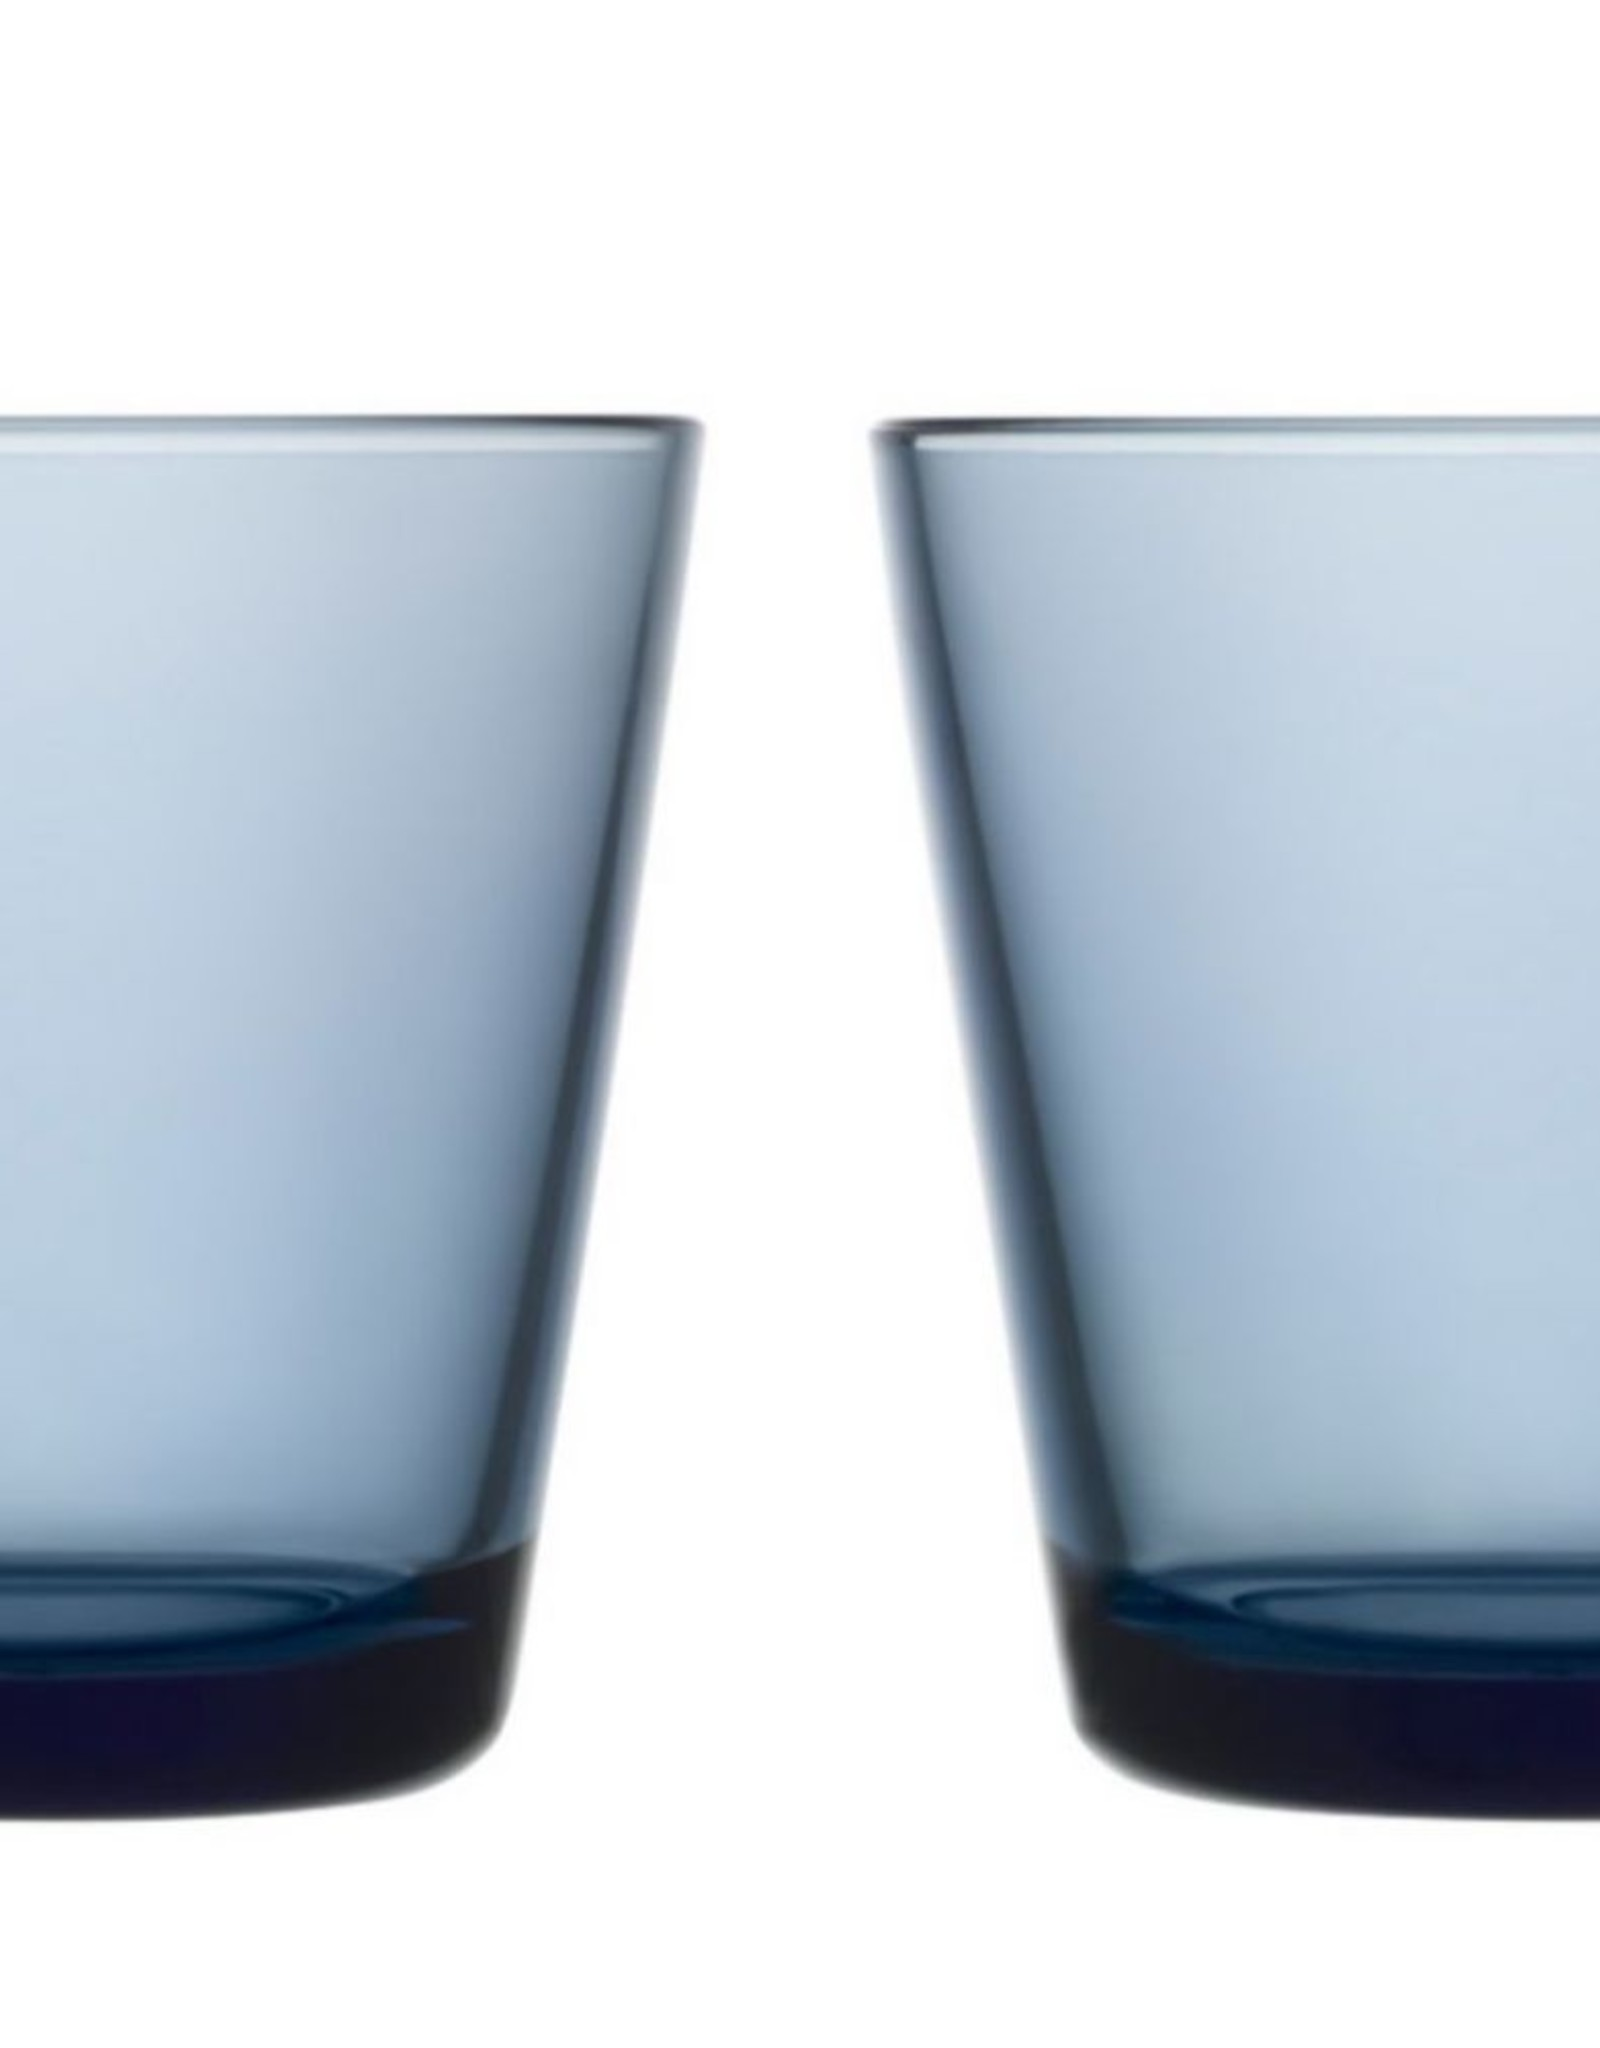 Iittala Iittala Kartio Glas - 21 cl - Regenblauw - 2 stuks